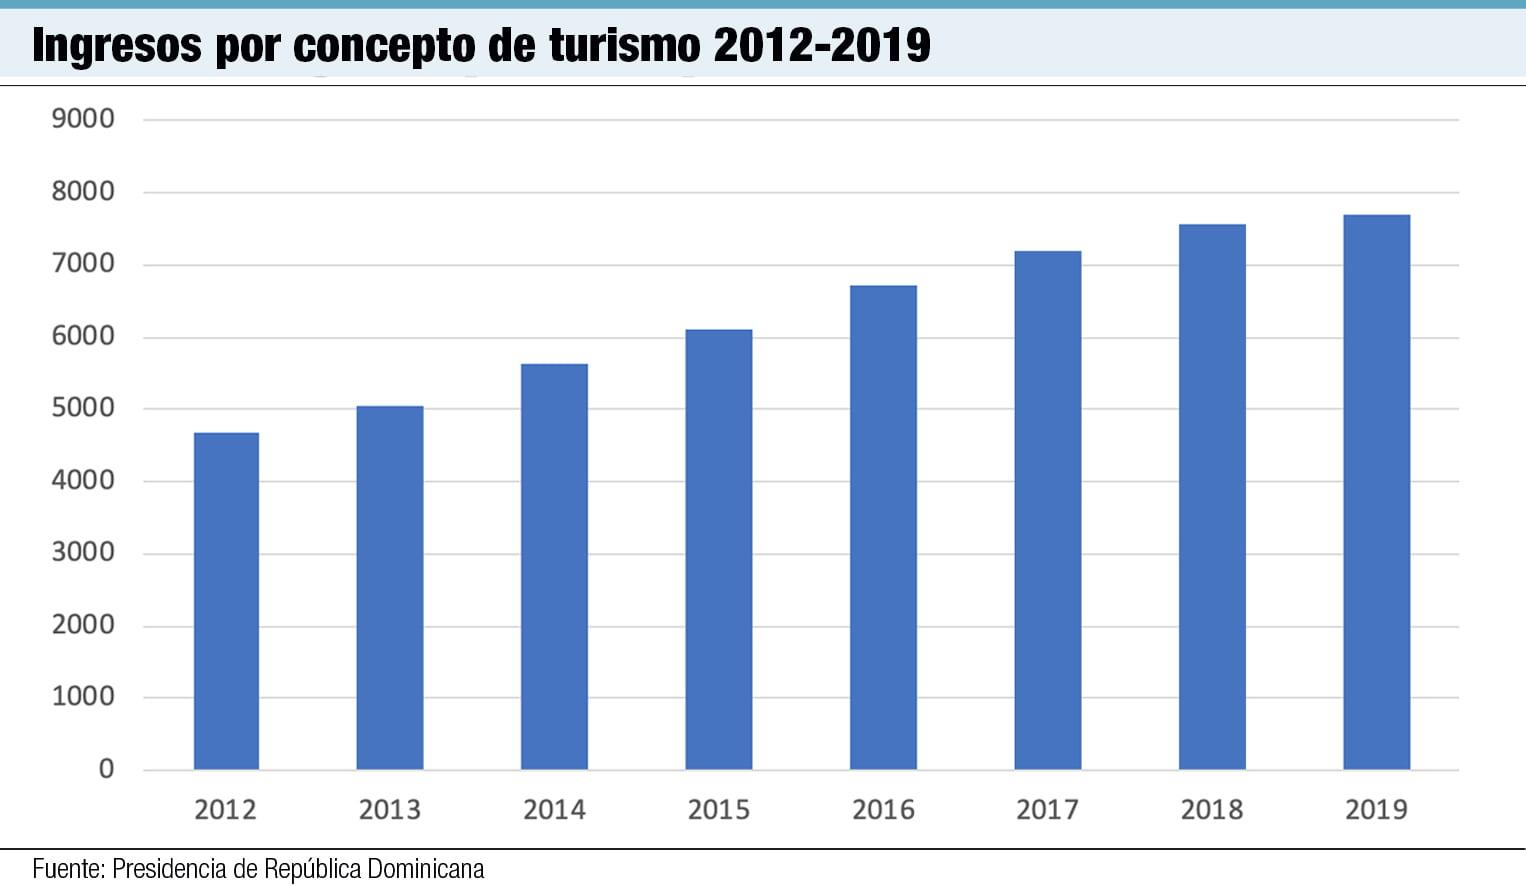 ingresos por concepto de turismo 2012 2019